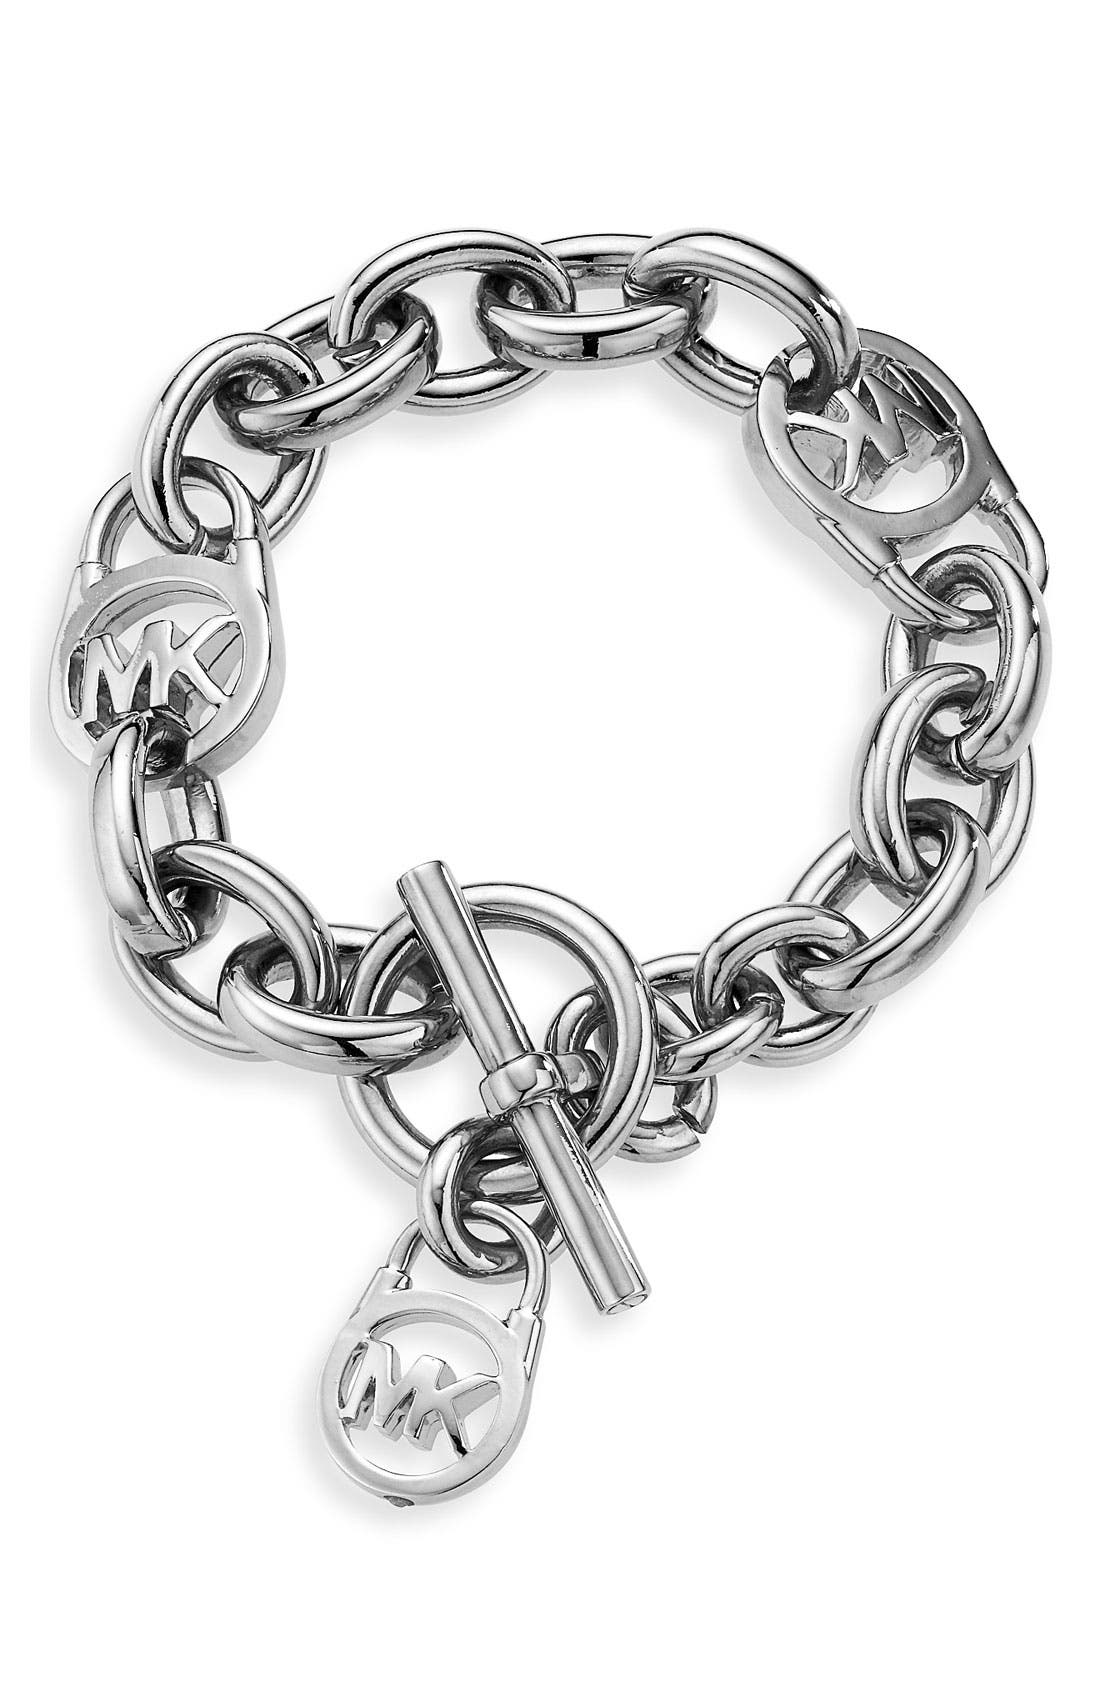 Main Image - Michael Kors Logo Toggle Bracelet